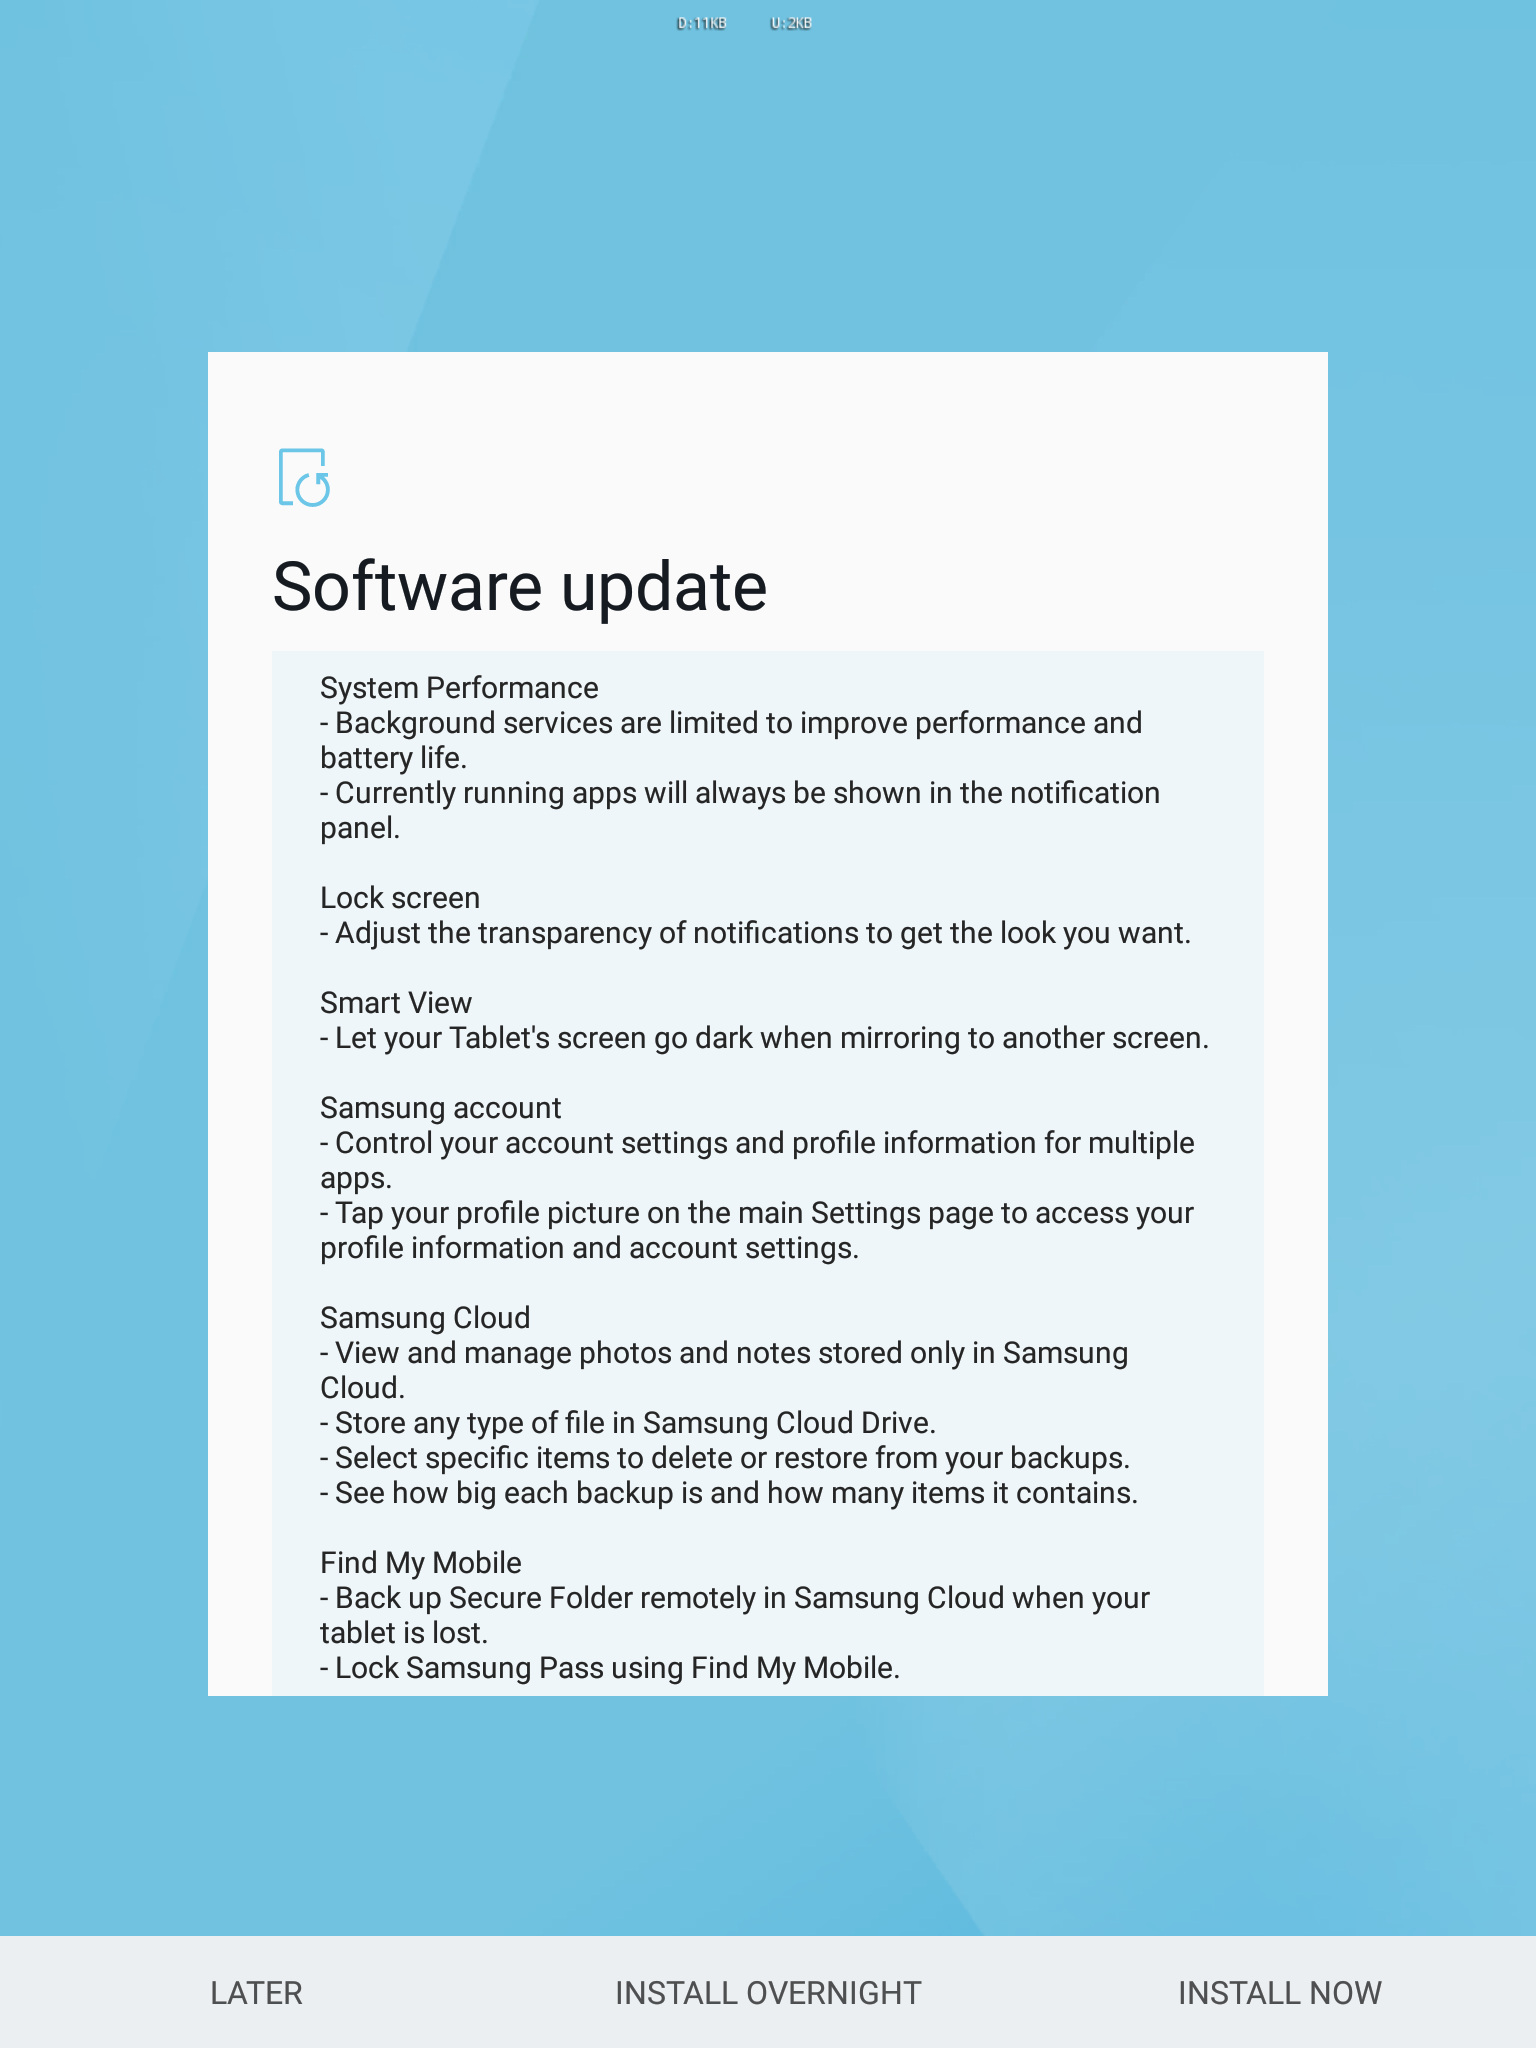 Update: Verizon variant too] Samsung finally pushes Oreo to